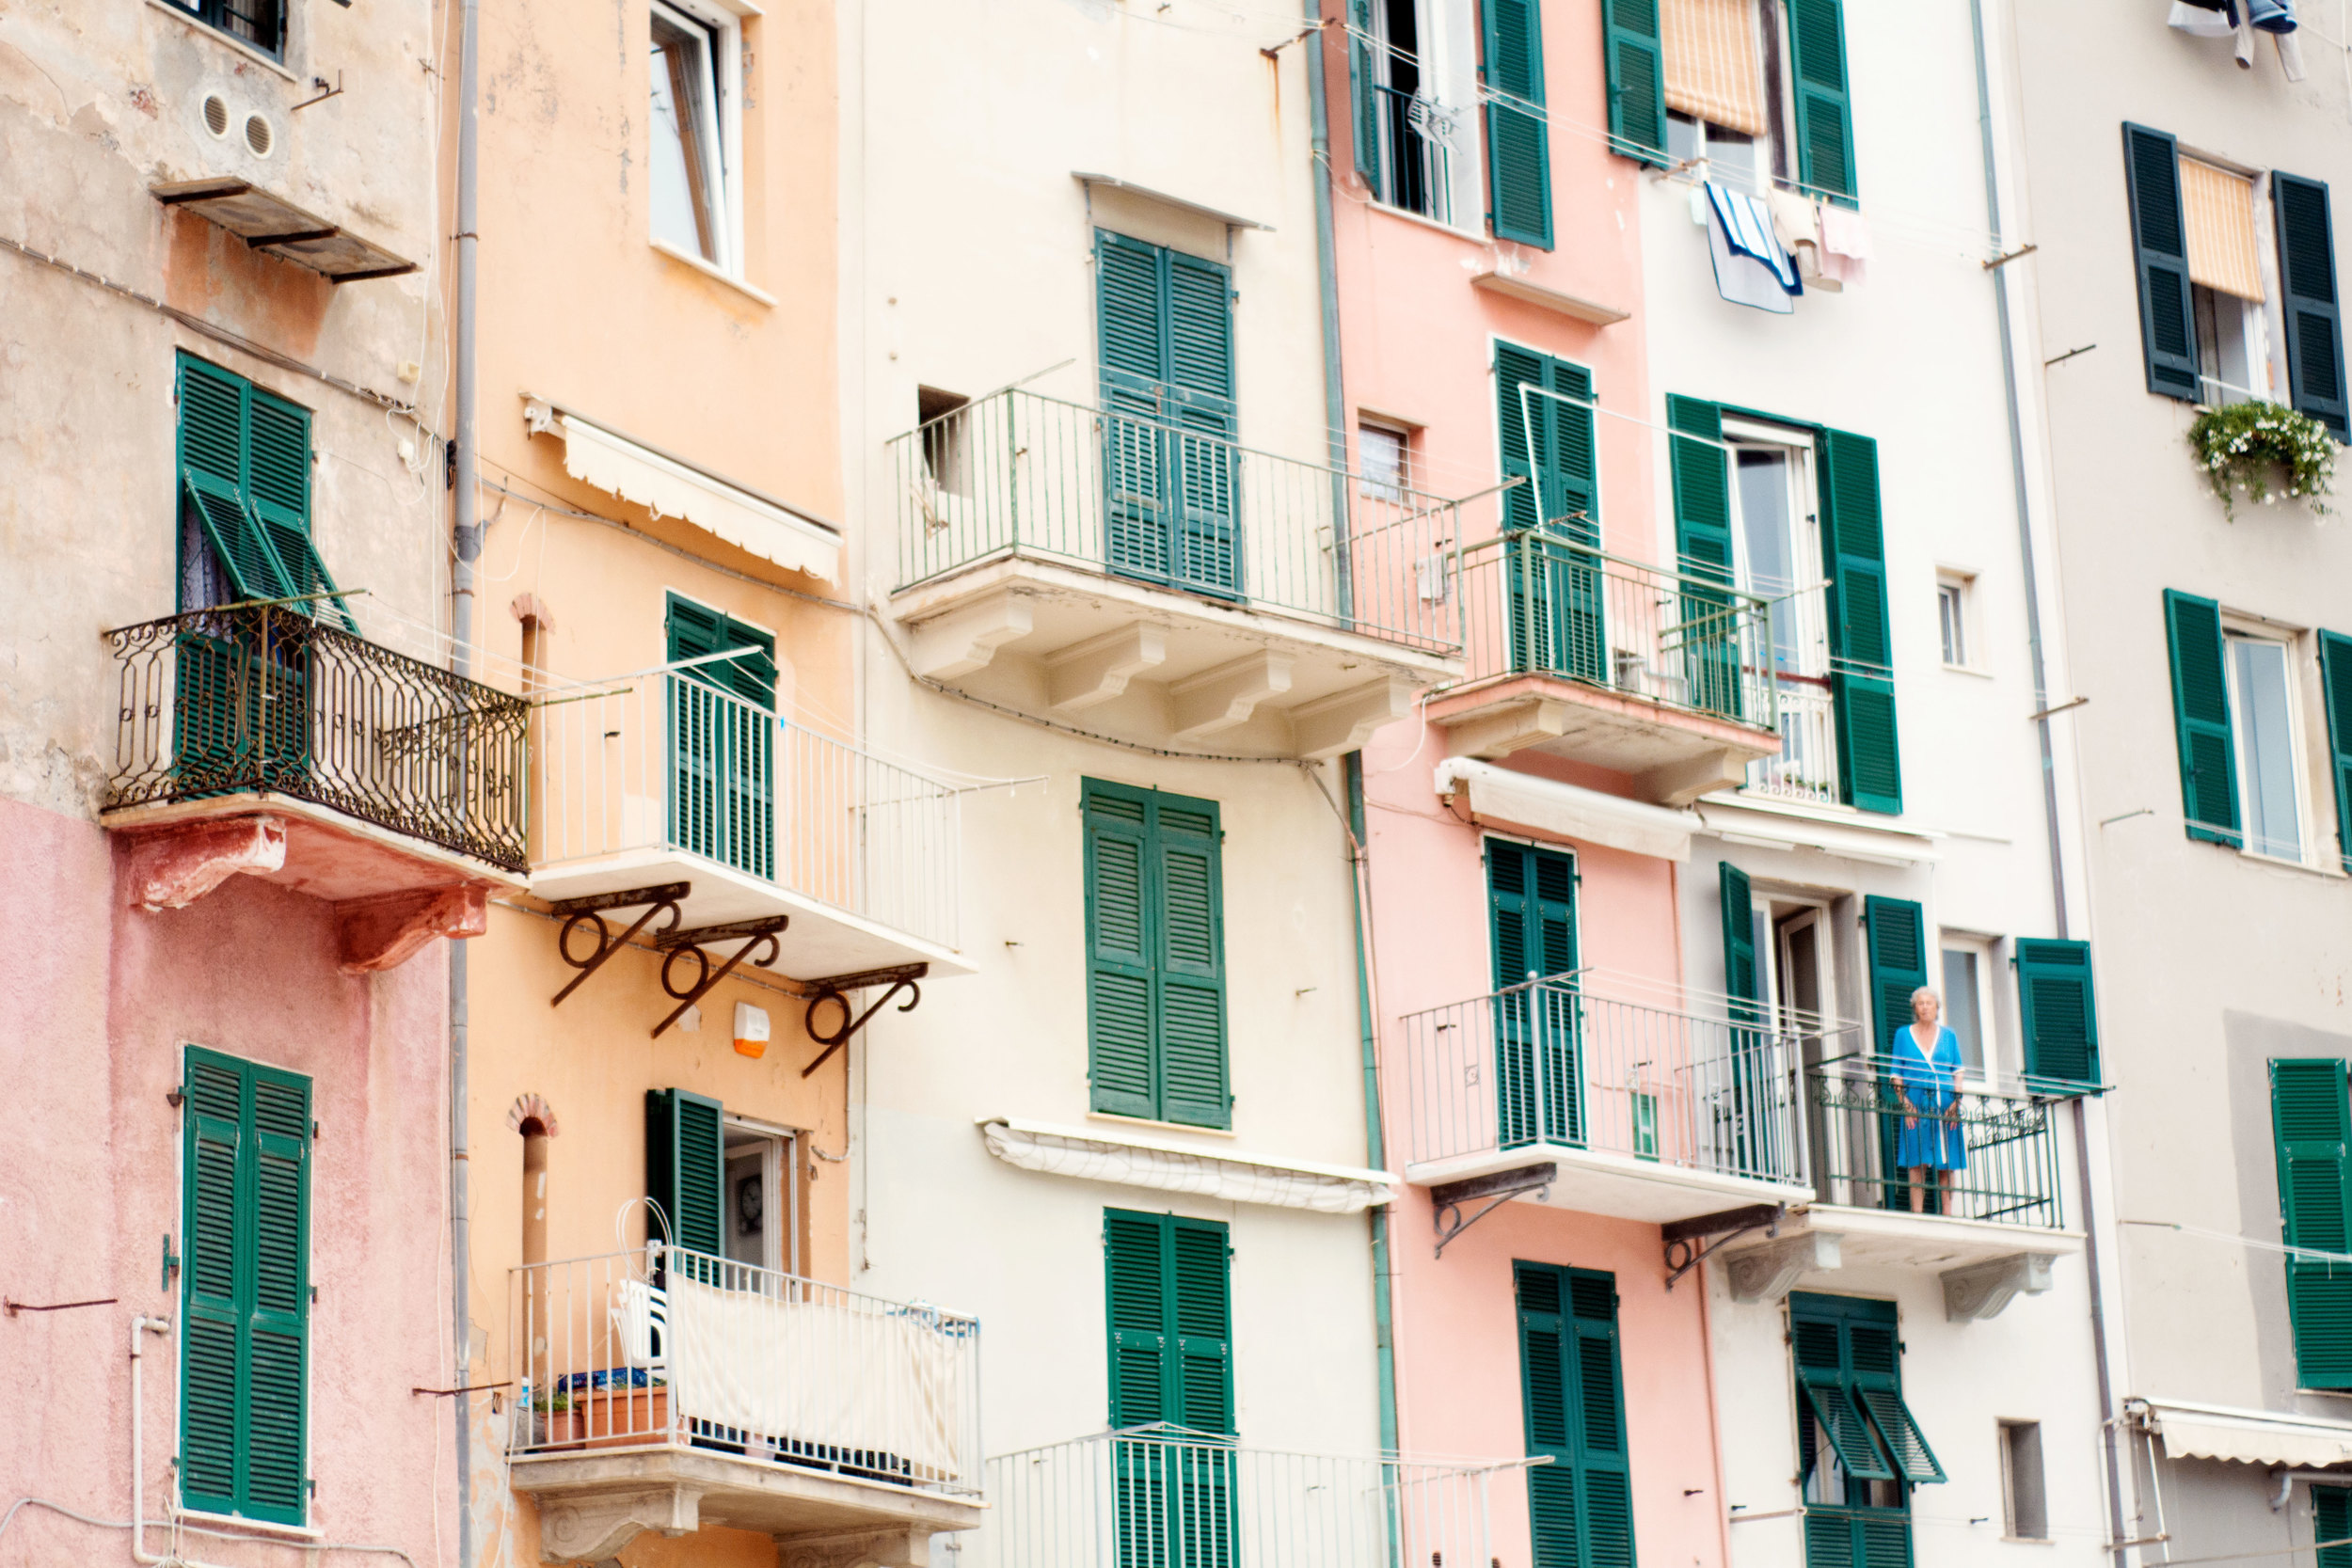 Portovenere Italy - Photo by Annie Mertlich